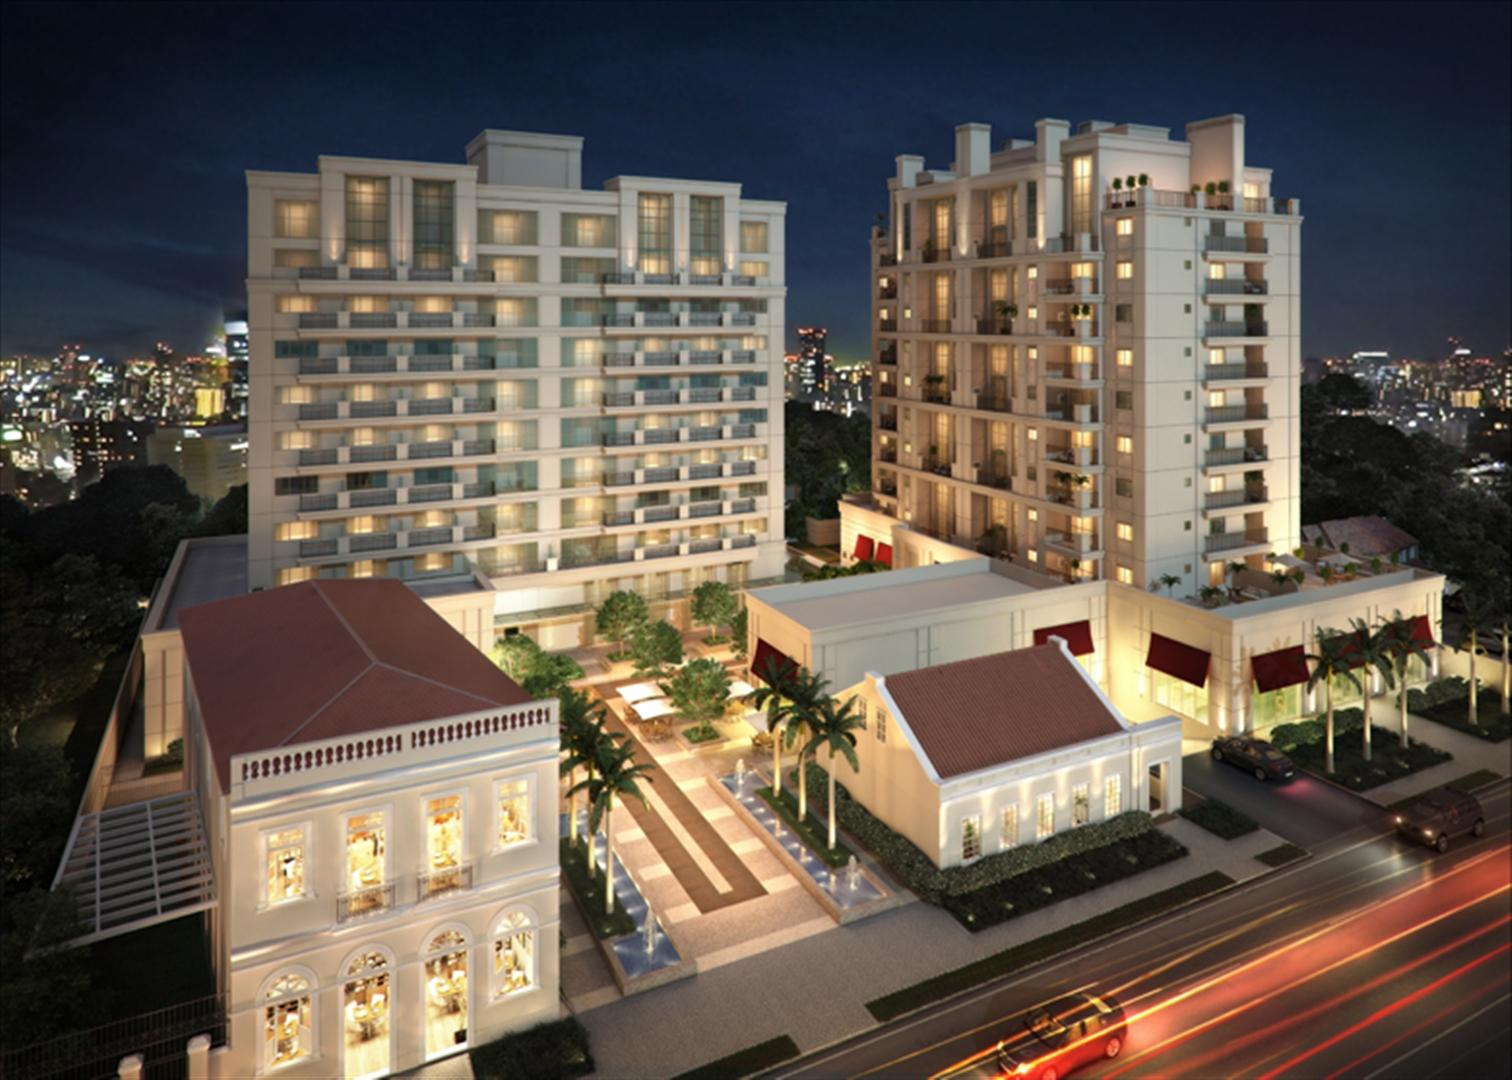 Fachada | 1550 Batel (Home Batel) – Apartamentono  Batel - Curitiba - Paraná